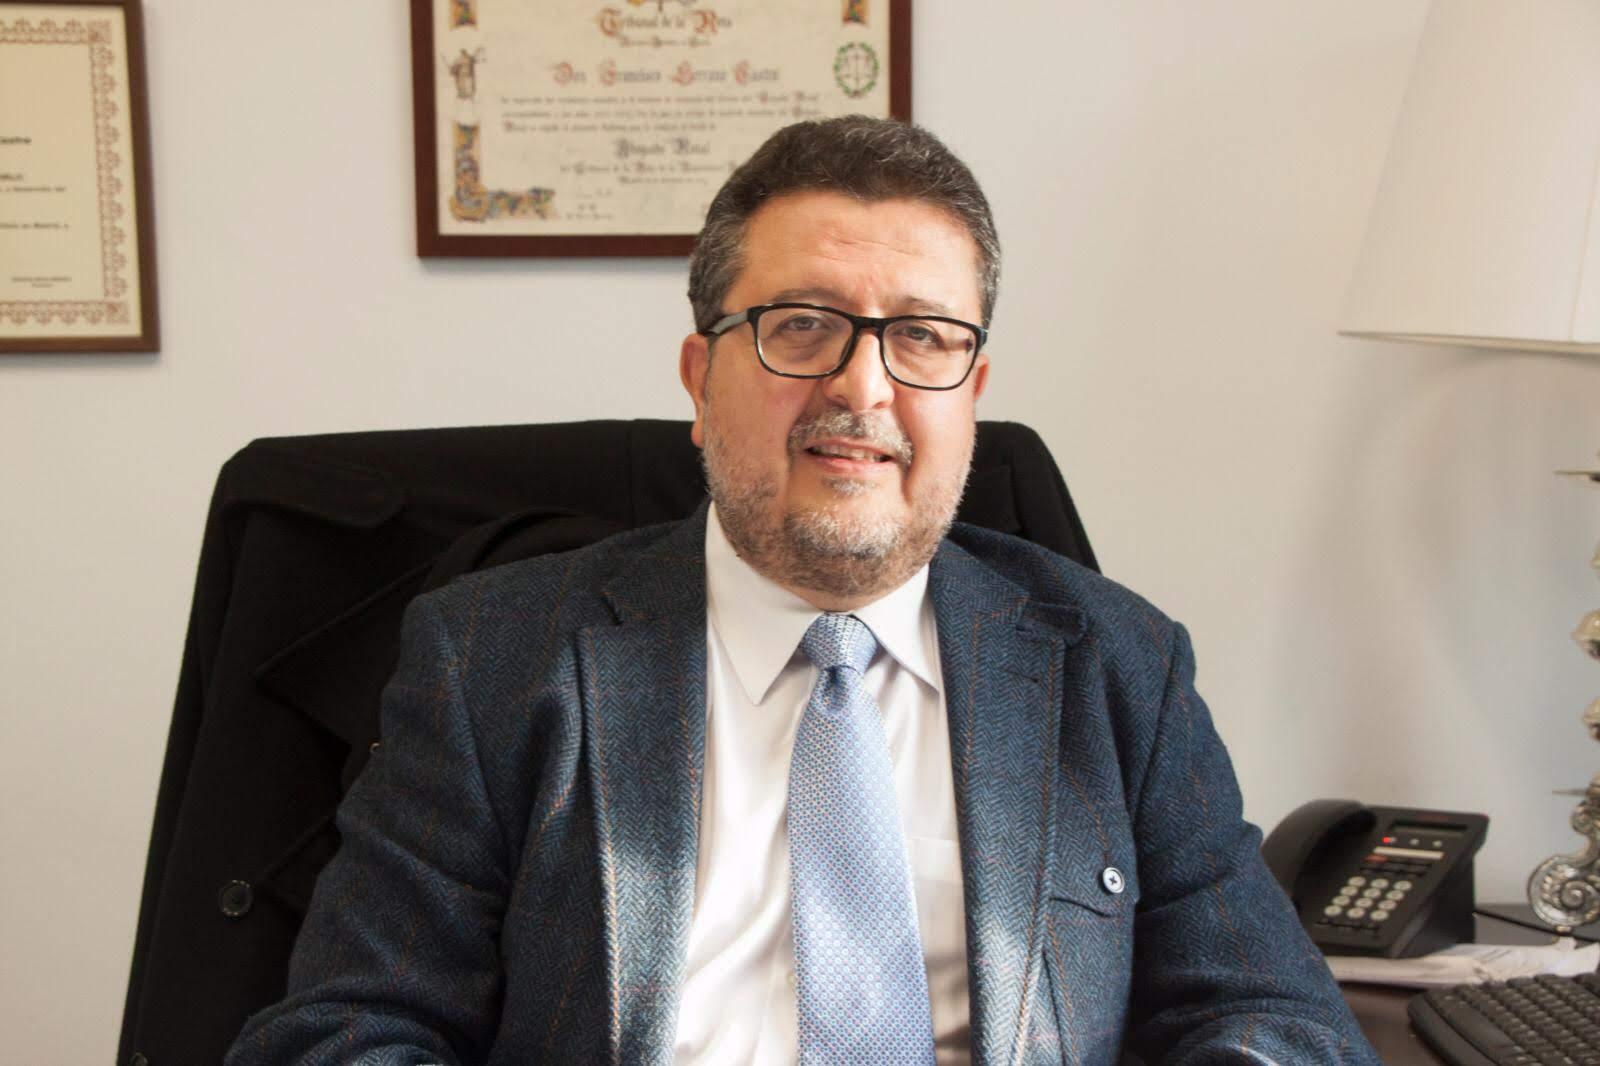 Entrevista del exjuez Serrano a Sevillainfo